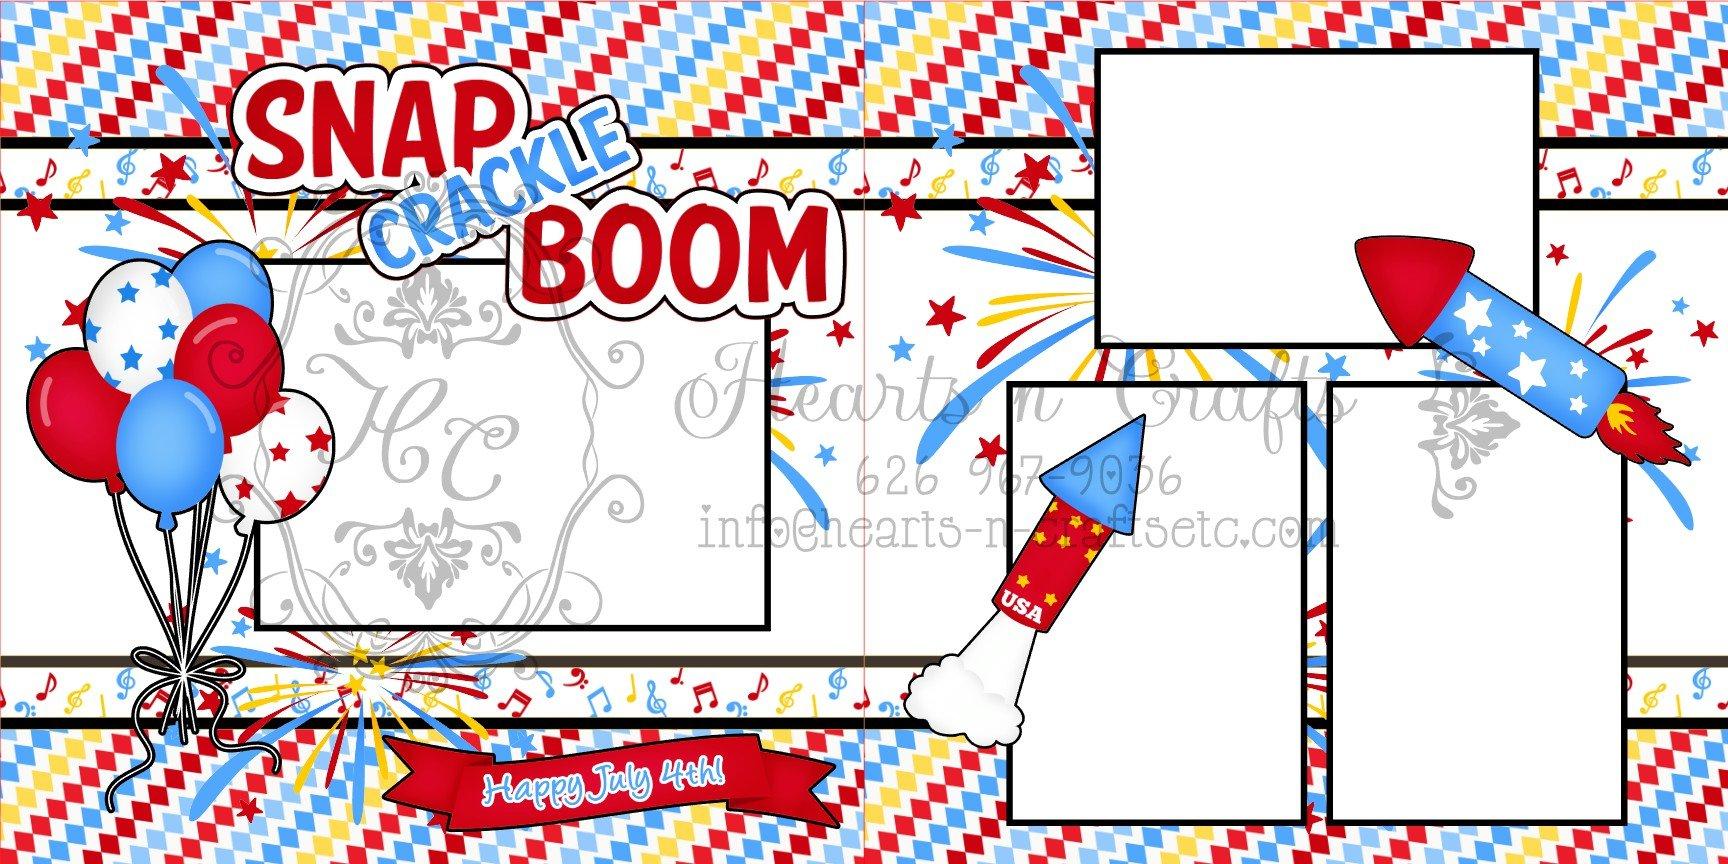 Snap Crackle Boom!